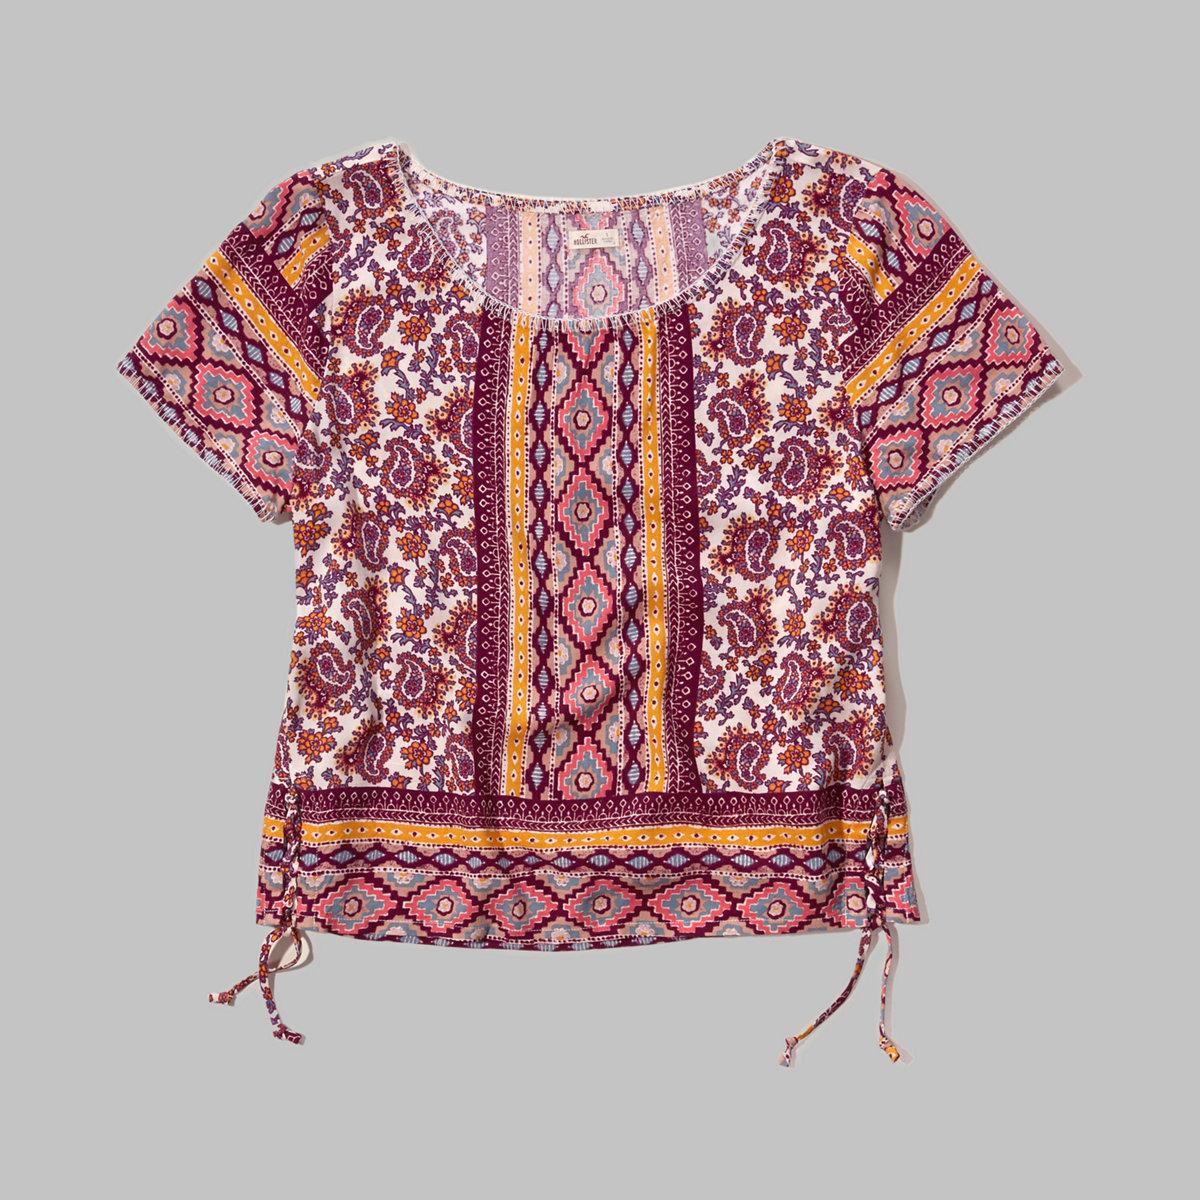 Printed Rayon Lace-Up T-Shirt